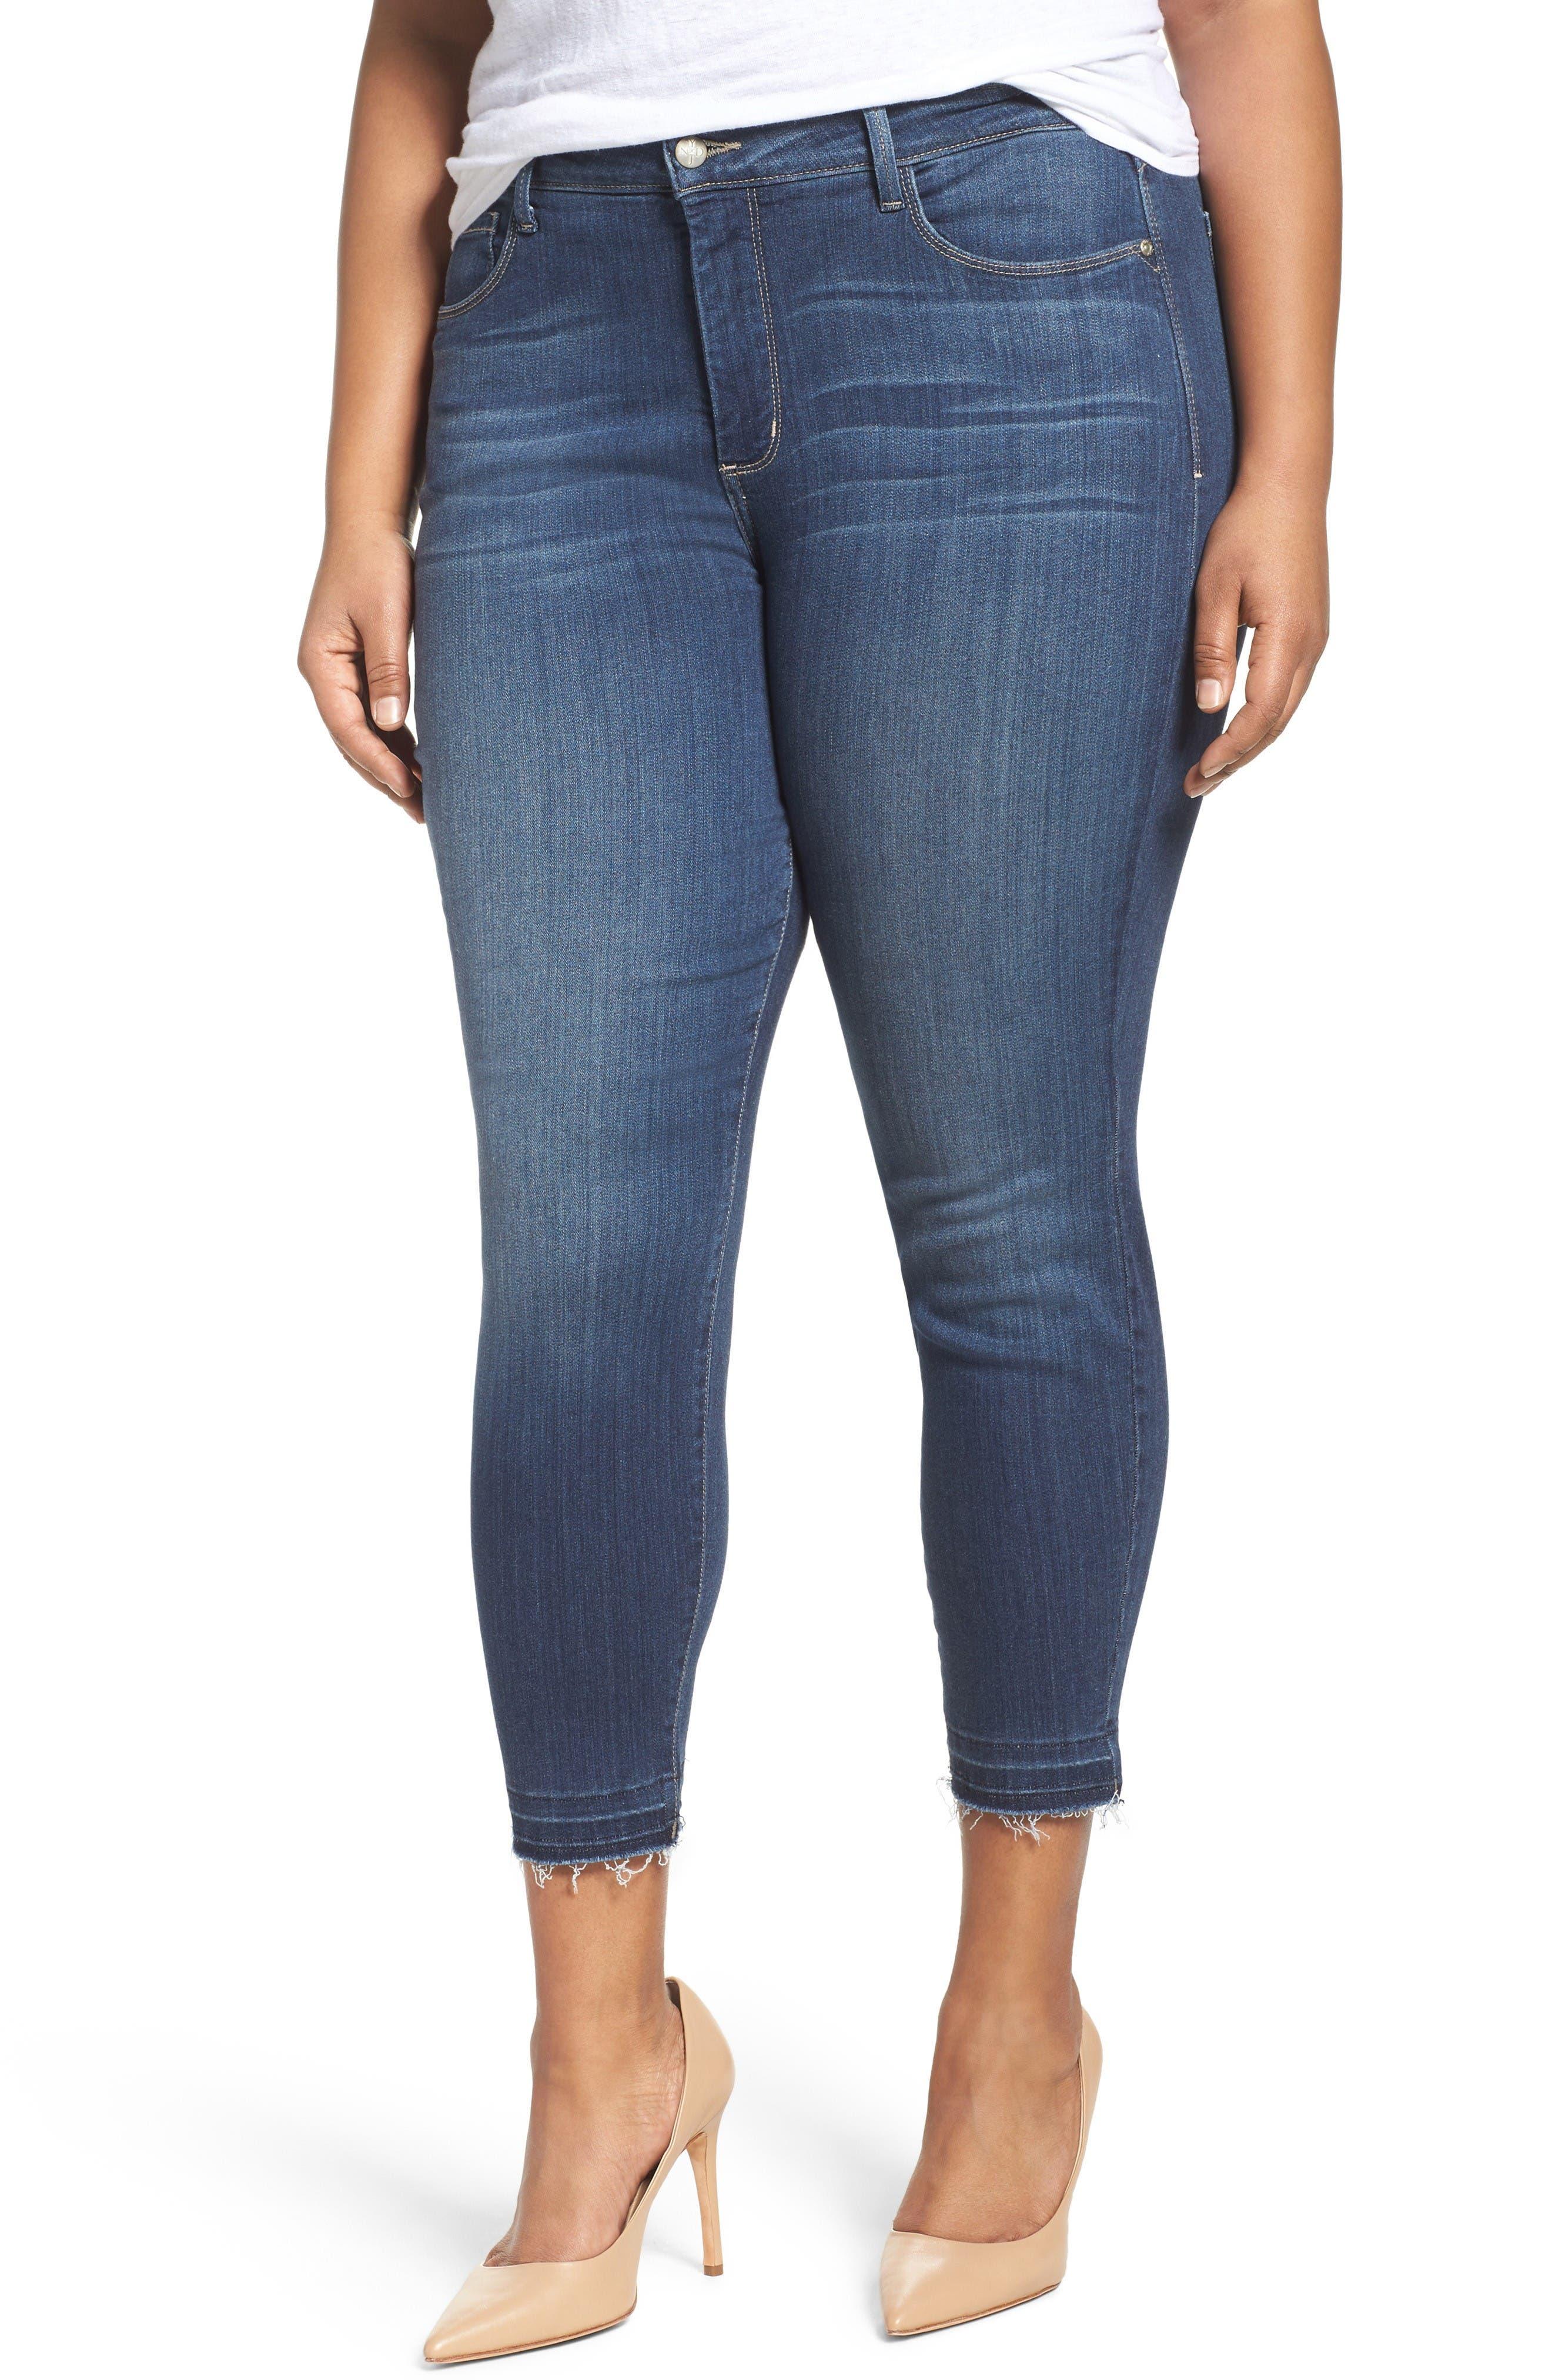 Alternate Image 1 Selected - NYDJ Ami Release Hem Stretch Skinny Jeans (Plus Size)